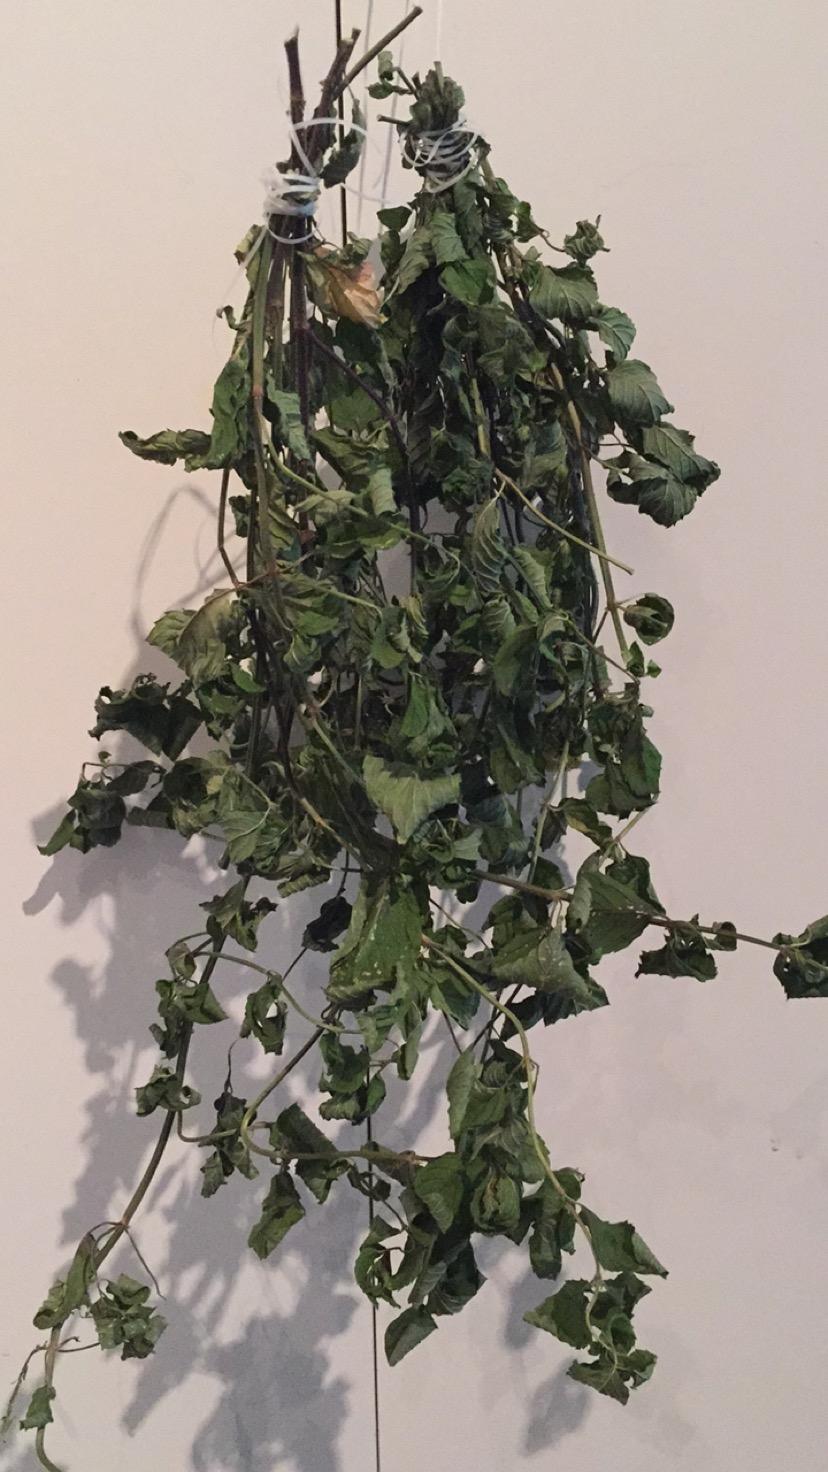 Drying Mint Leaves